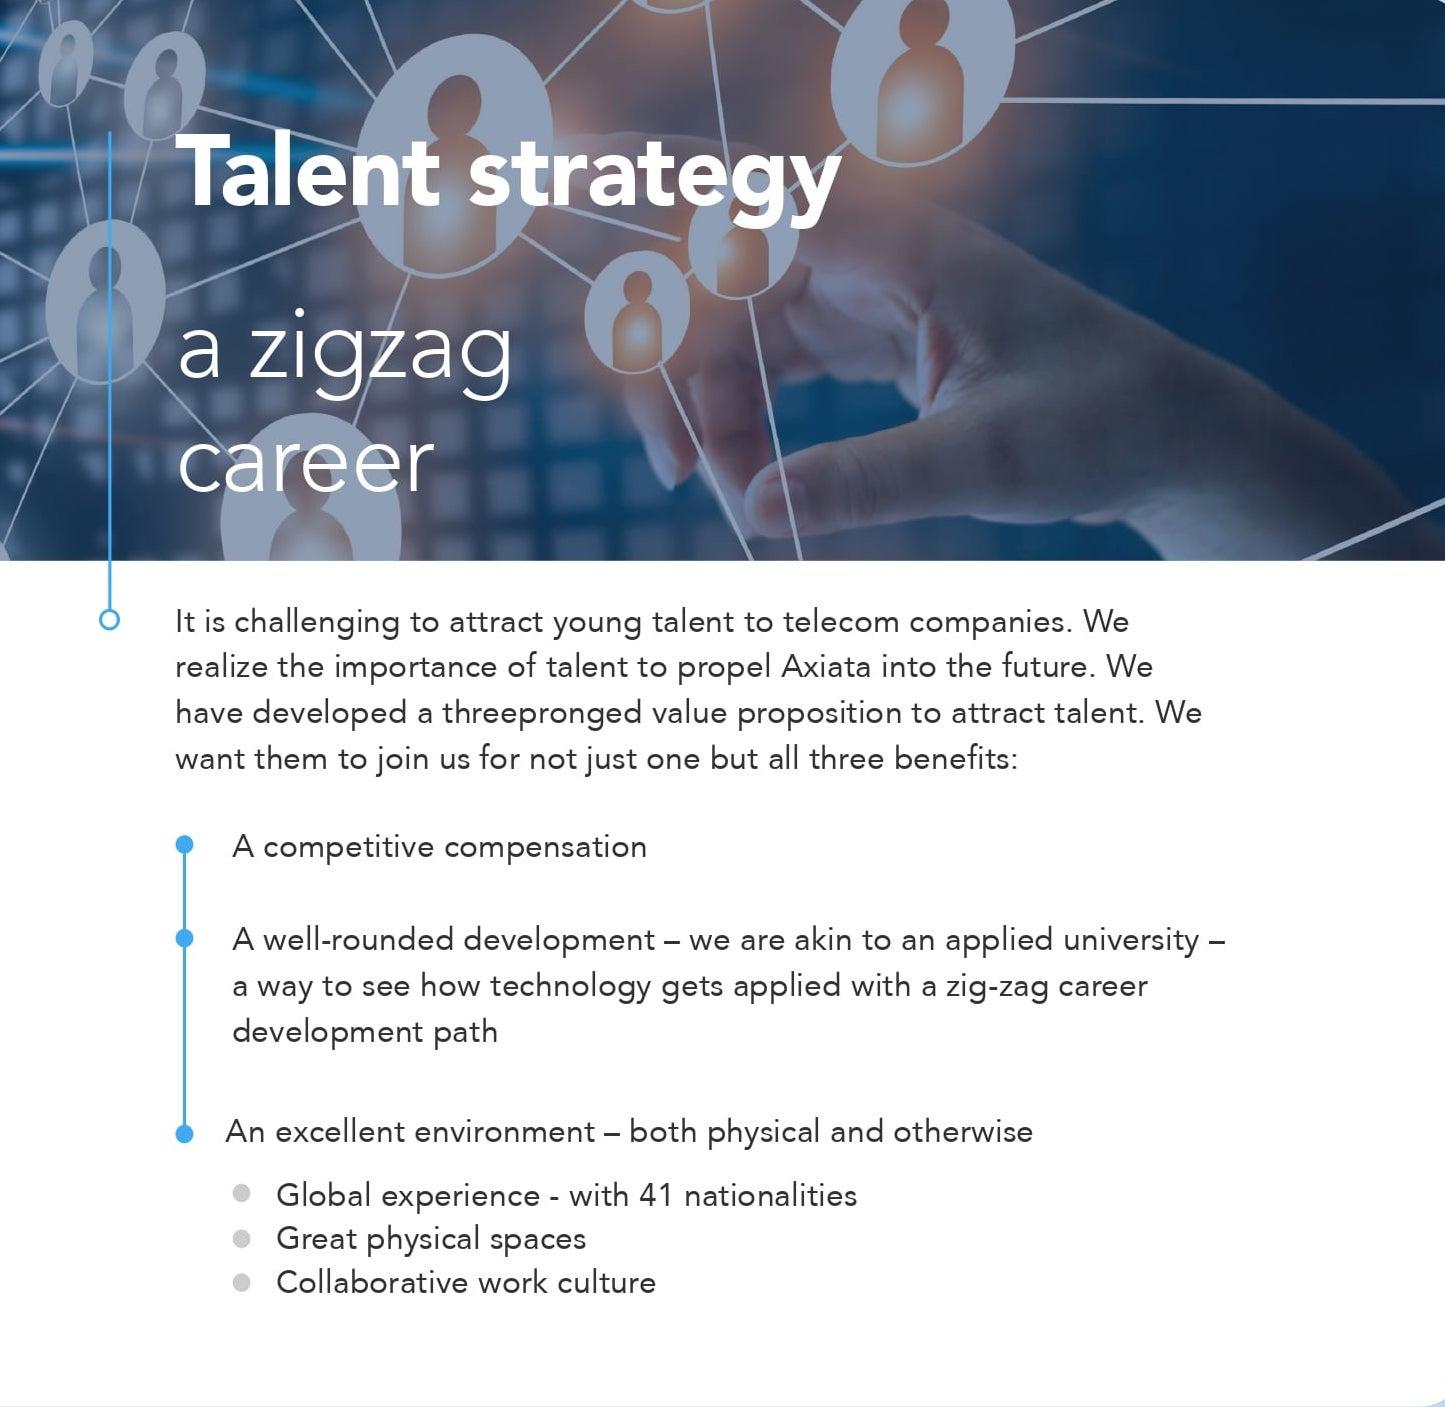 axiata, telecoms, career, career development, talent management